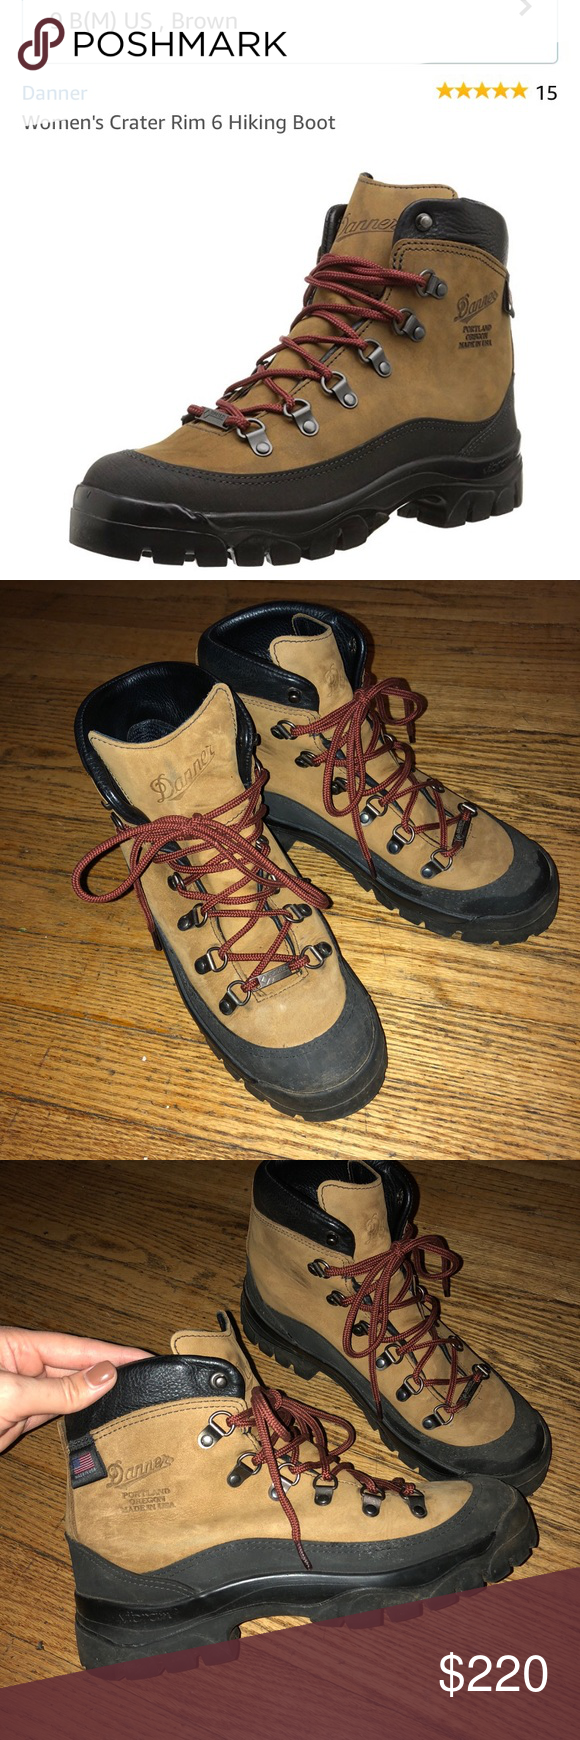 e6060730ba3 Danner women's crater rim 6 hikers. Size 9. Heavy duty hiking boots ...